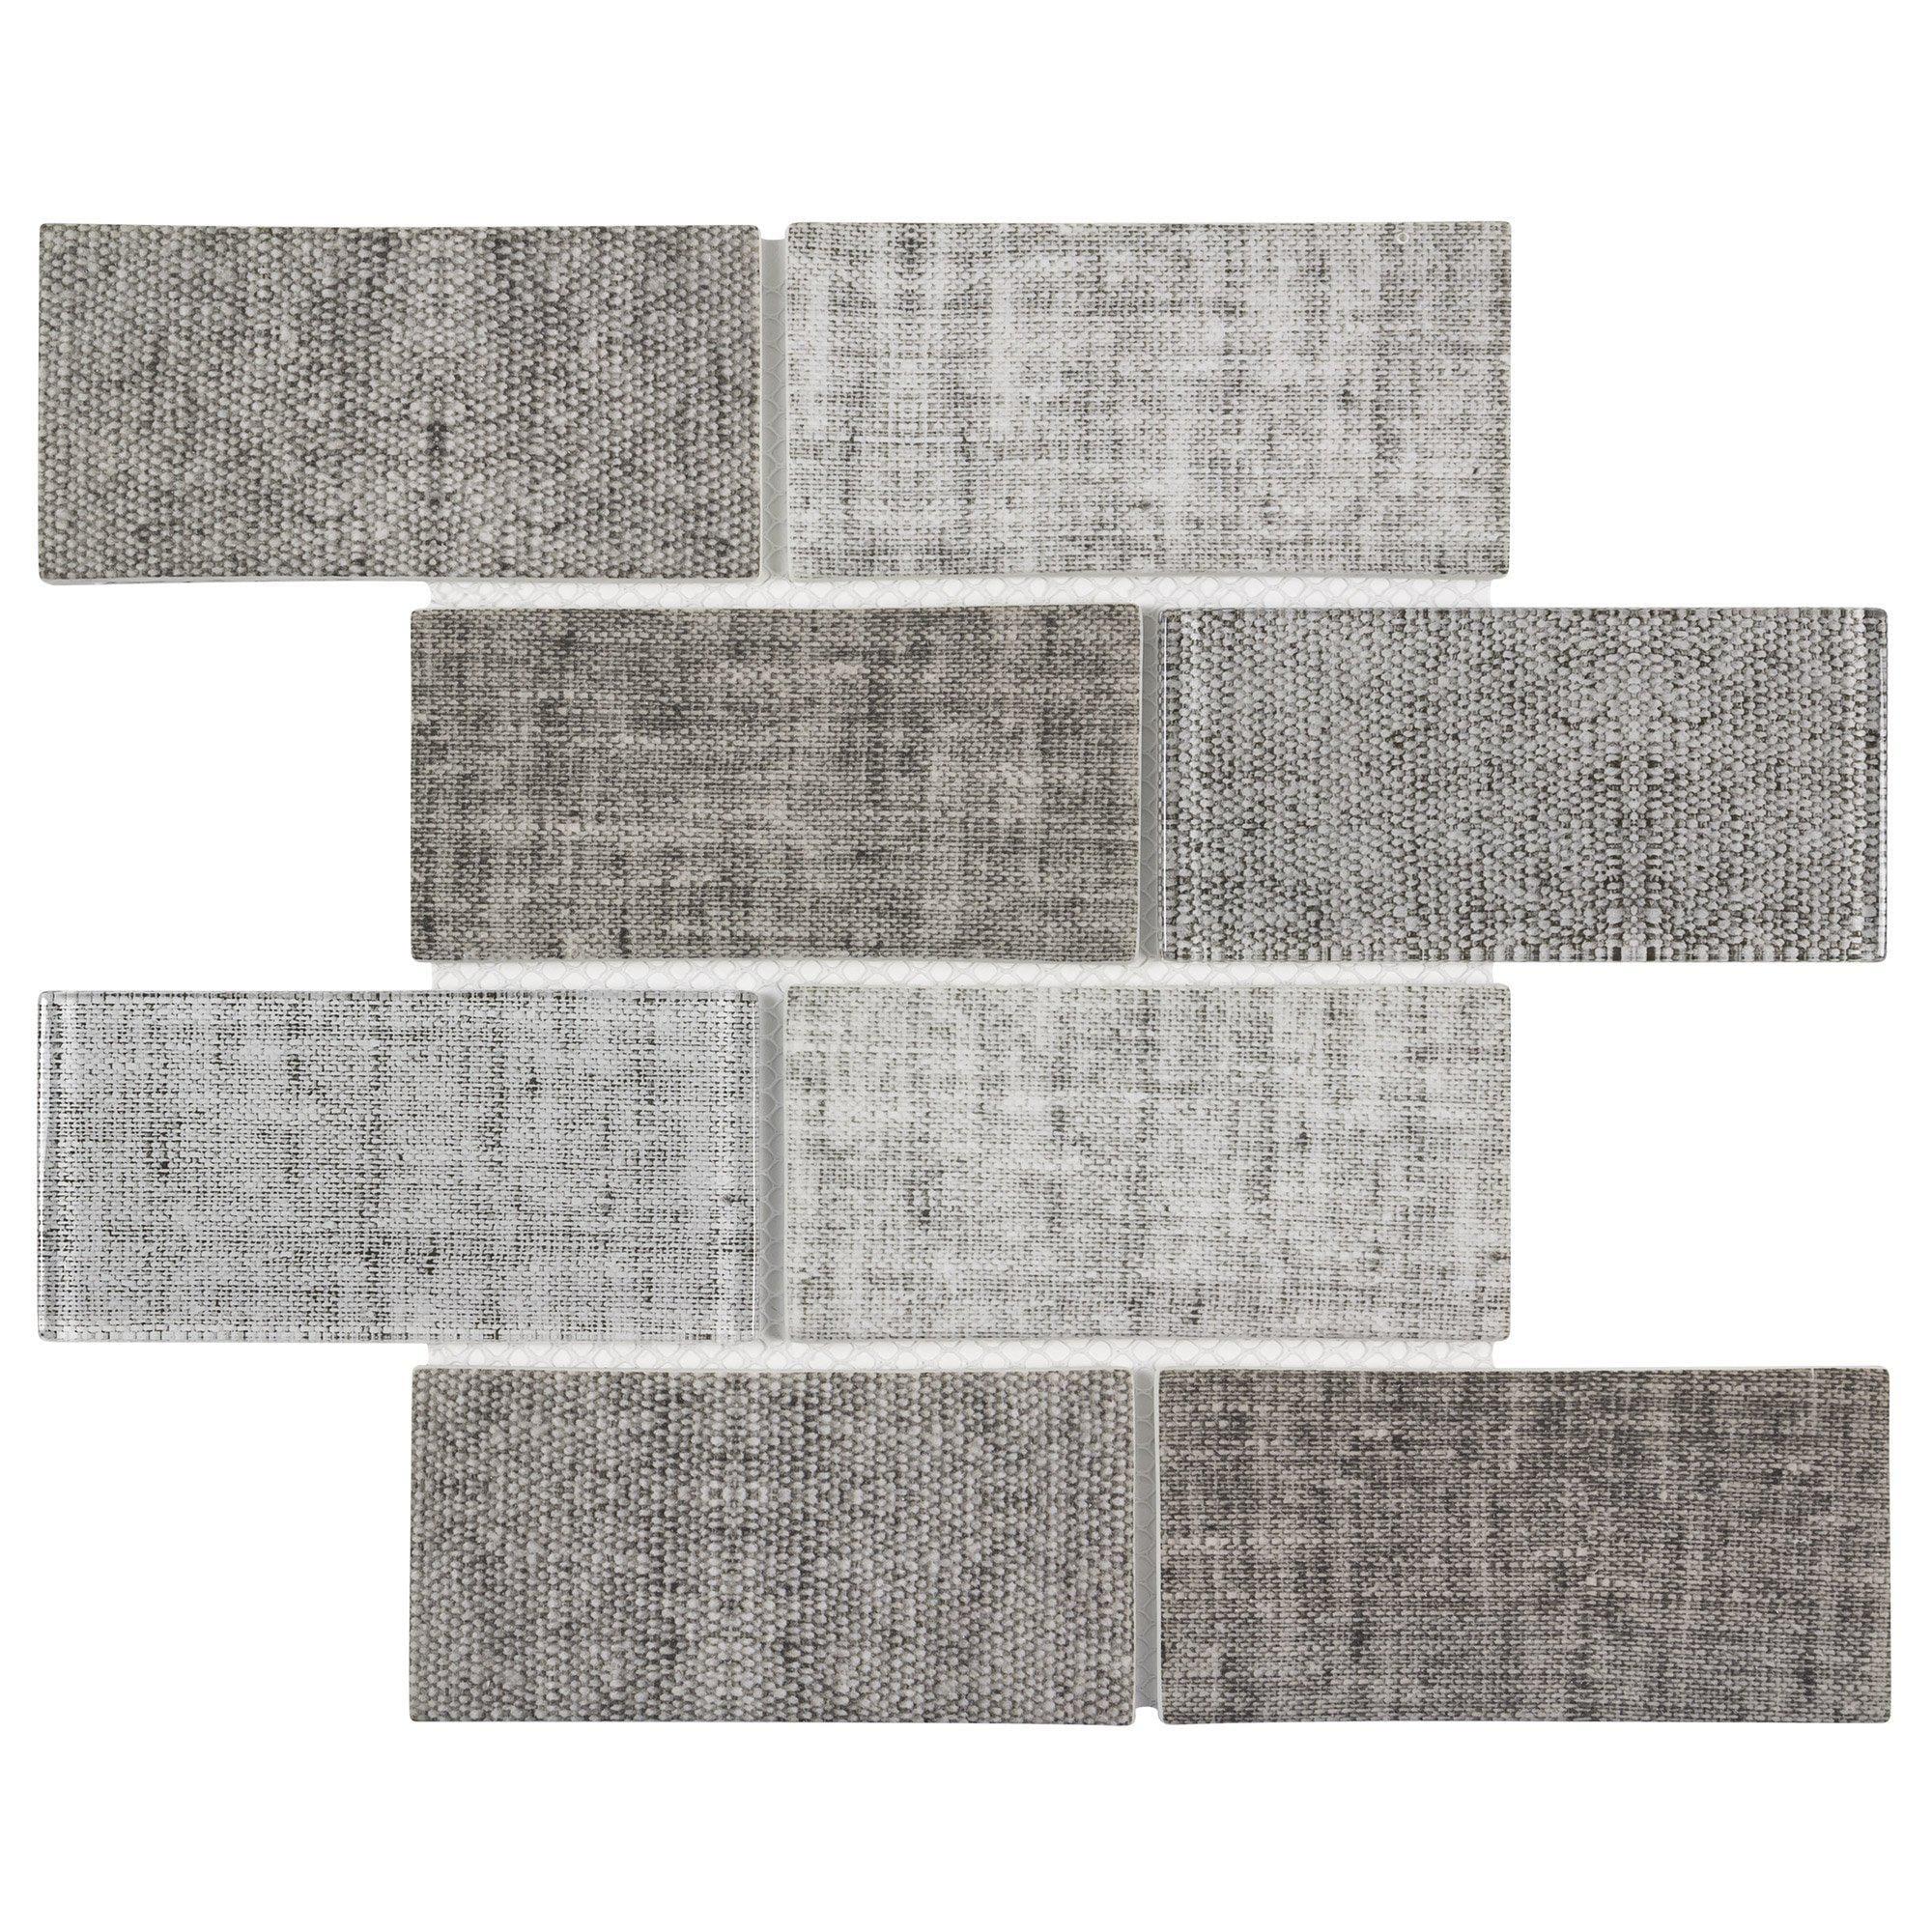 mto0517 classic 3x6 brick subway beige gray linen look matte glass mosaic tile